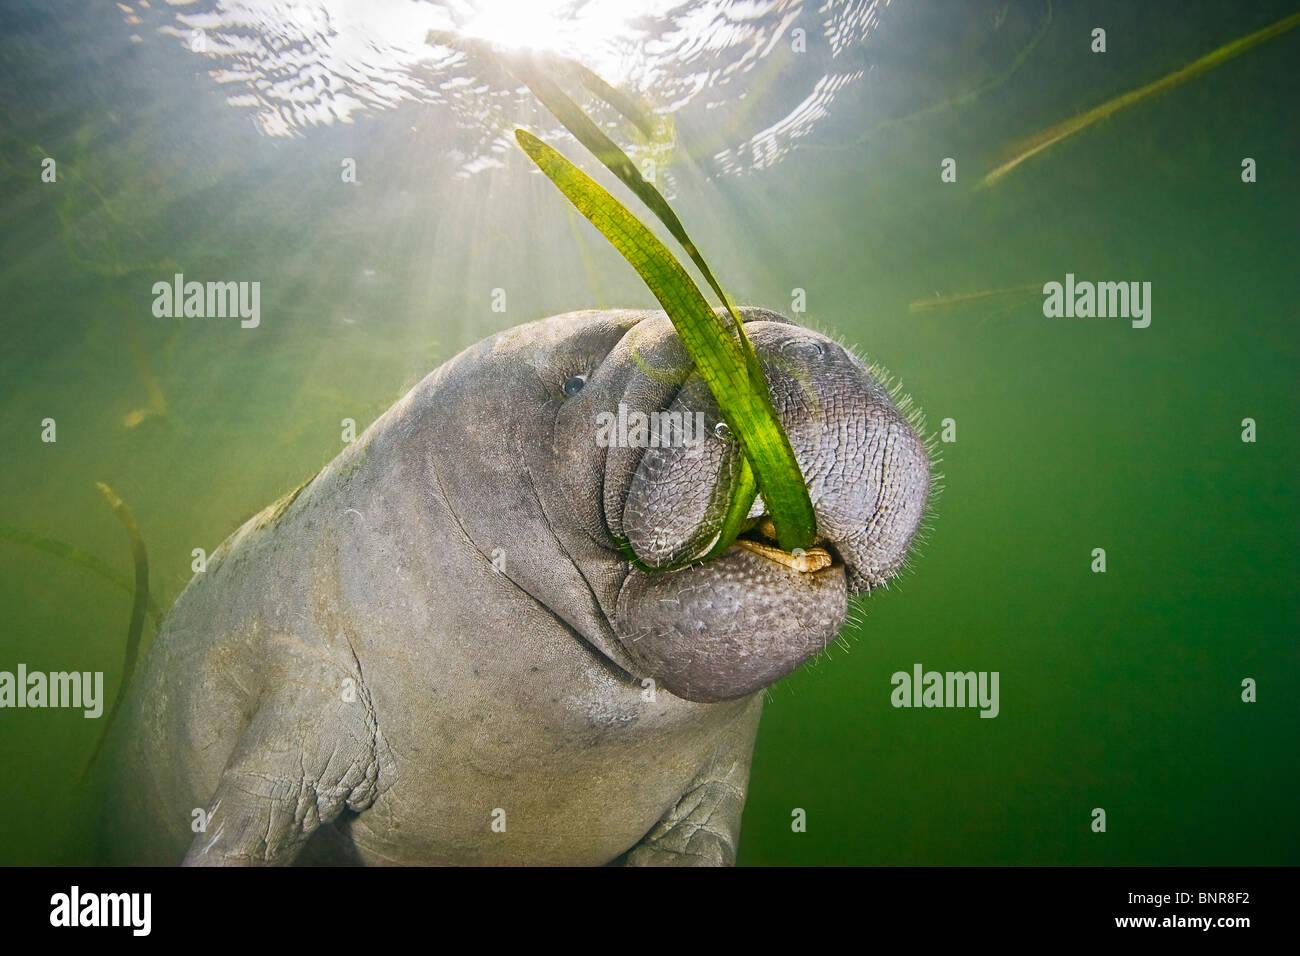 Florida, manatí Trichechus manatus latirostris, ternero alimentándose de algas marinas. Foto de stock